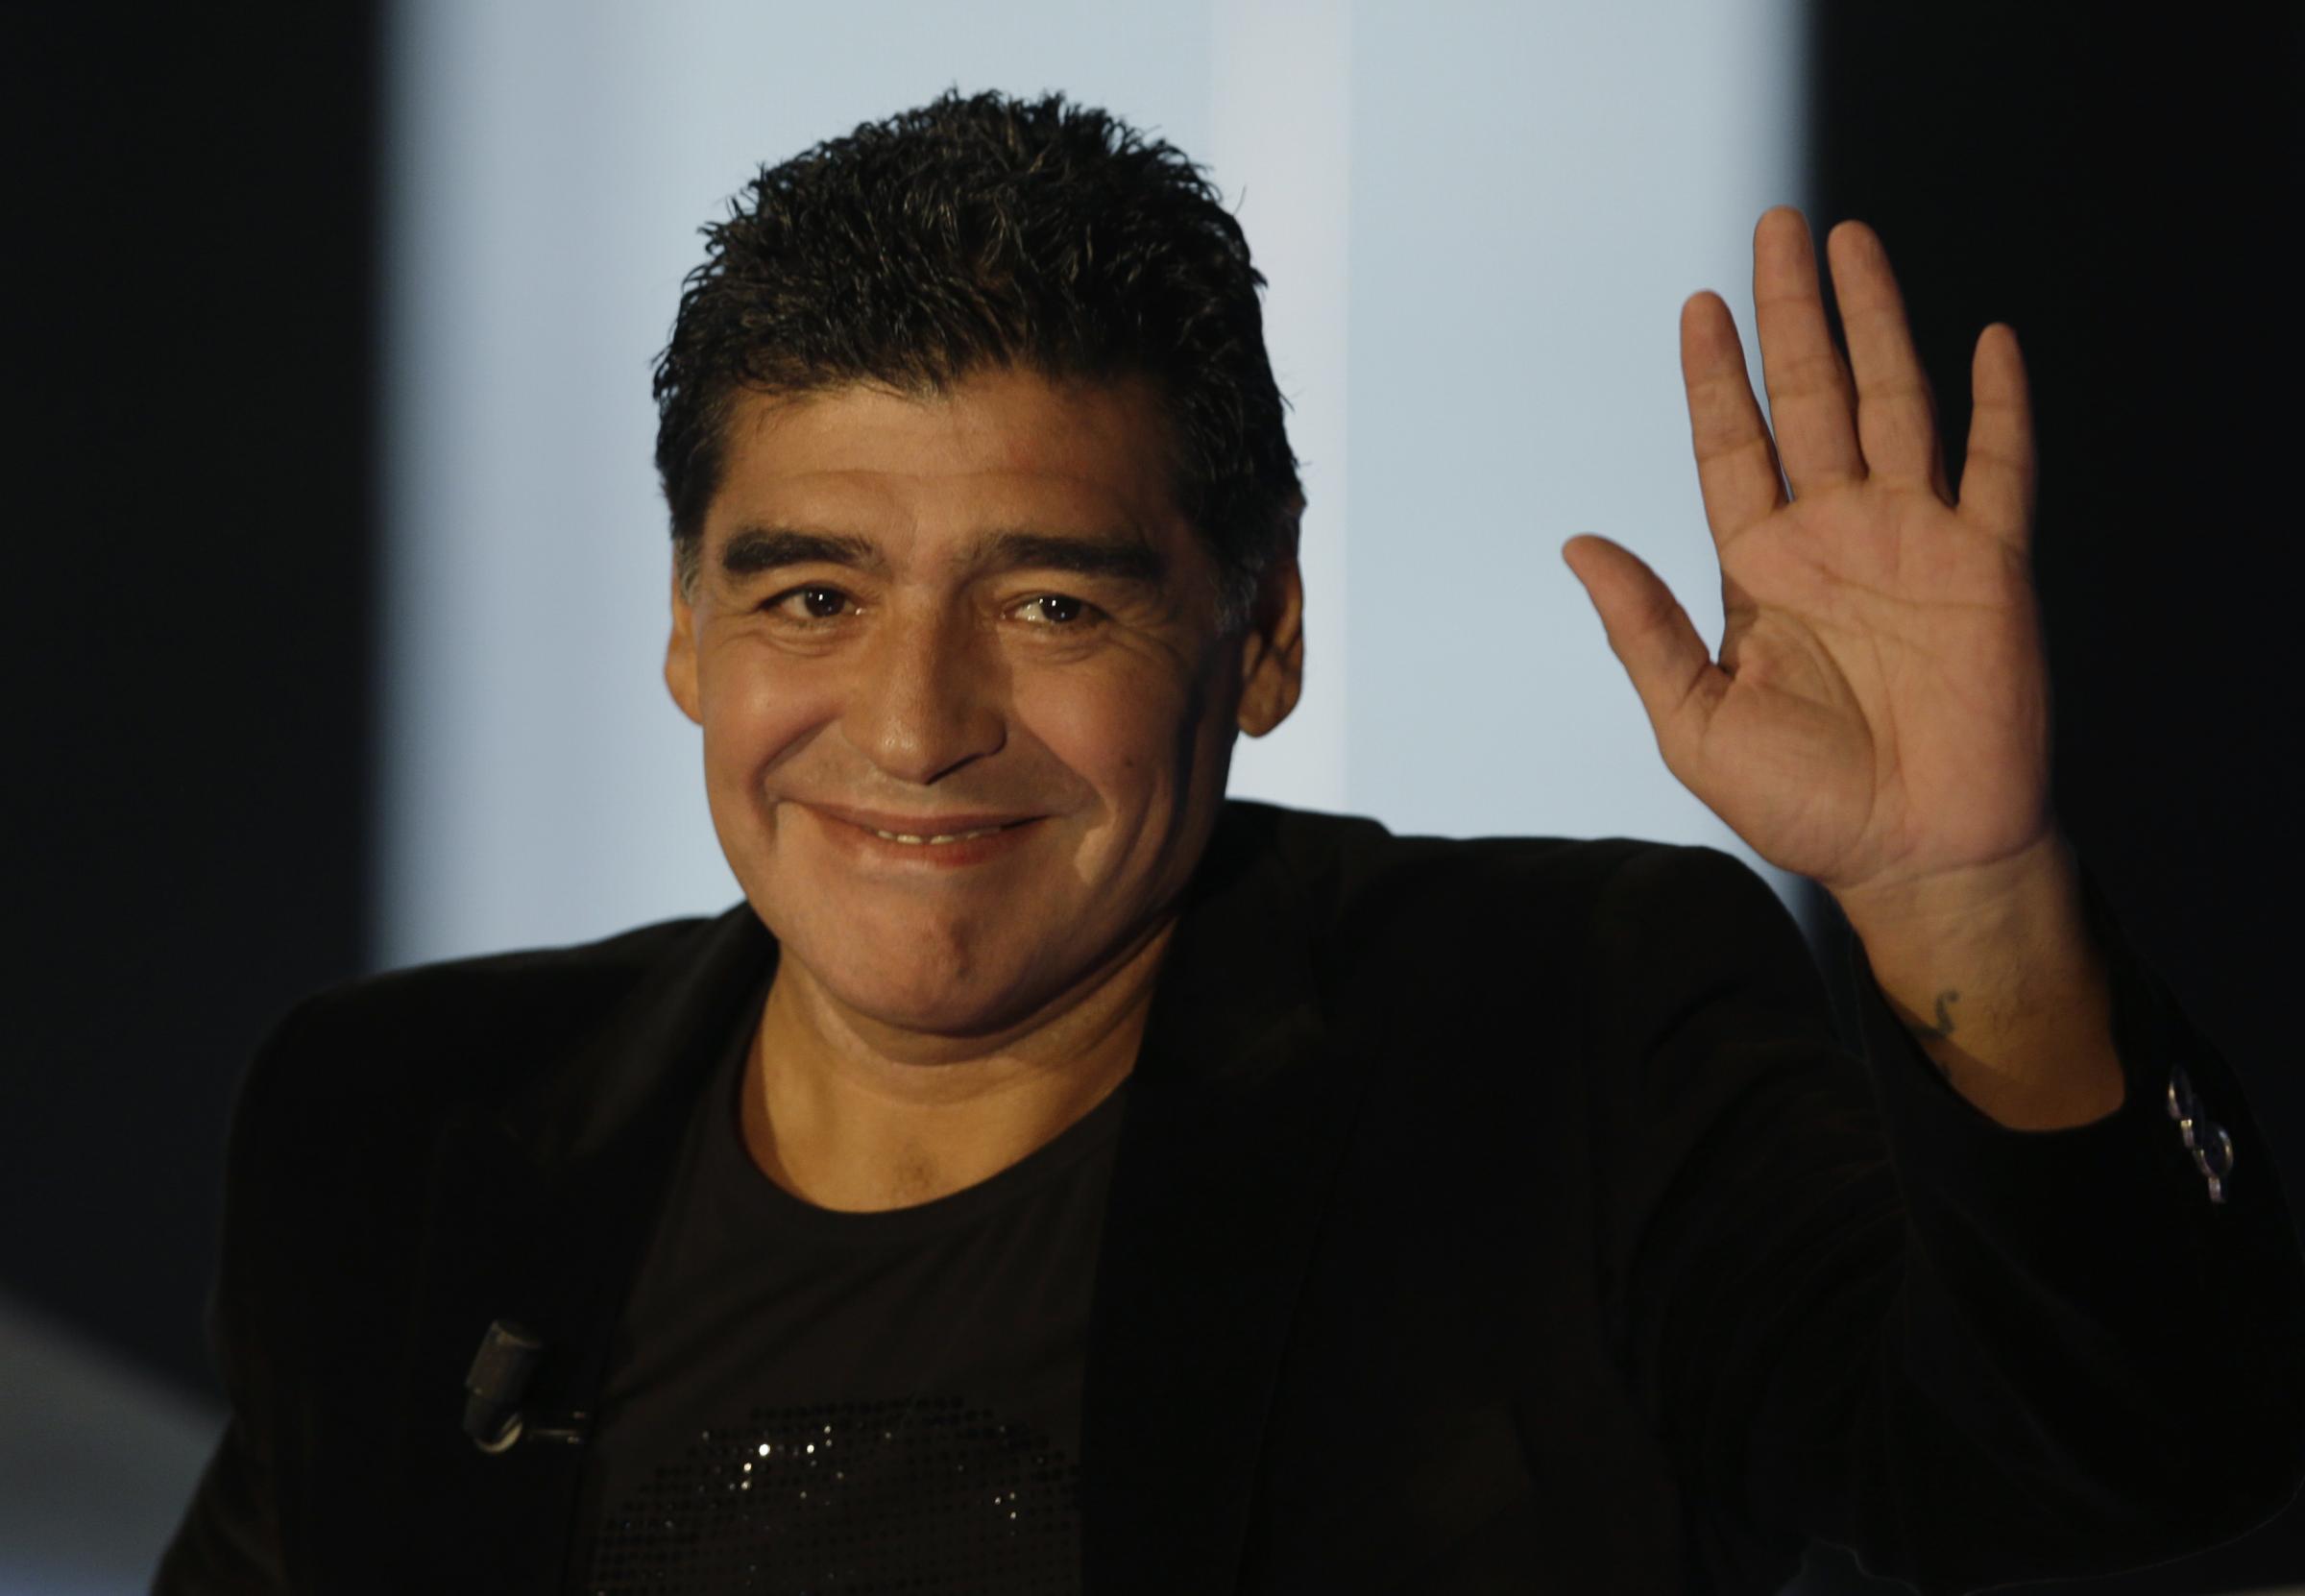 Diego Maradona saluta Pino Daniele (VIDEO)